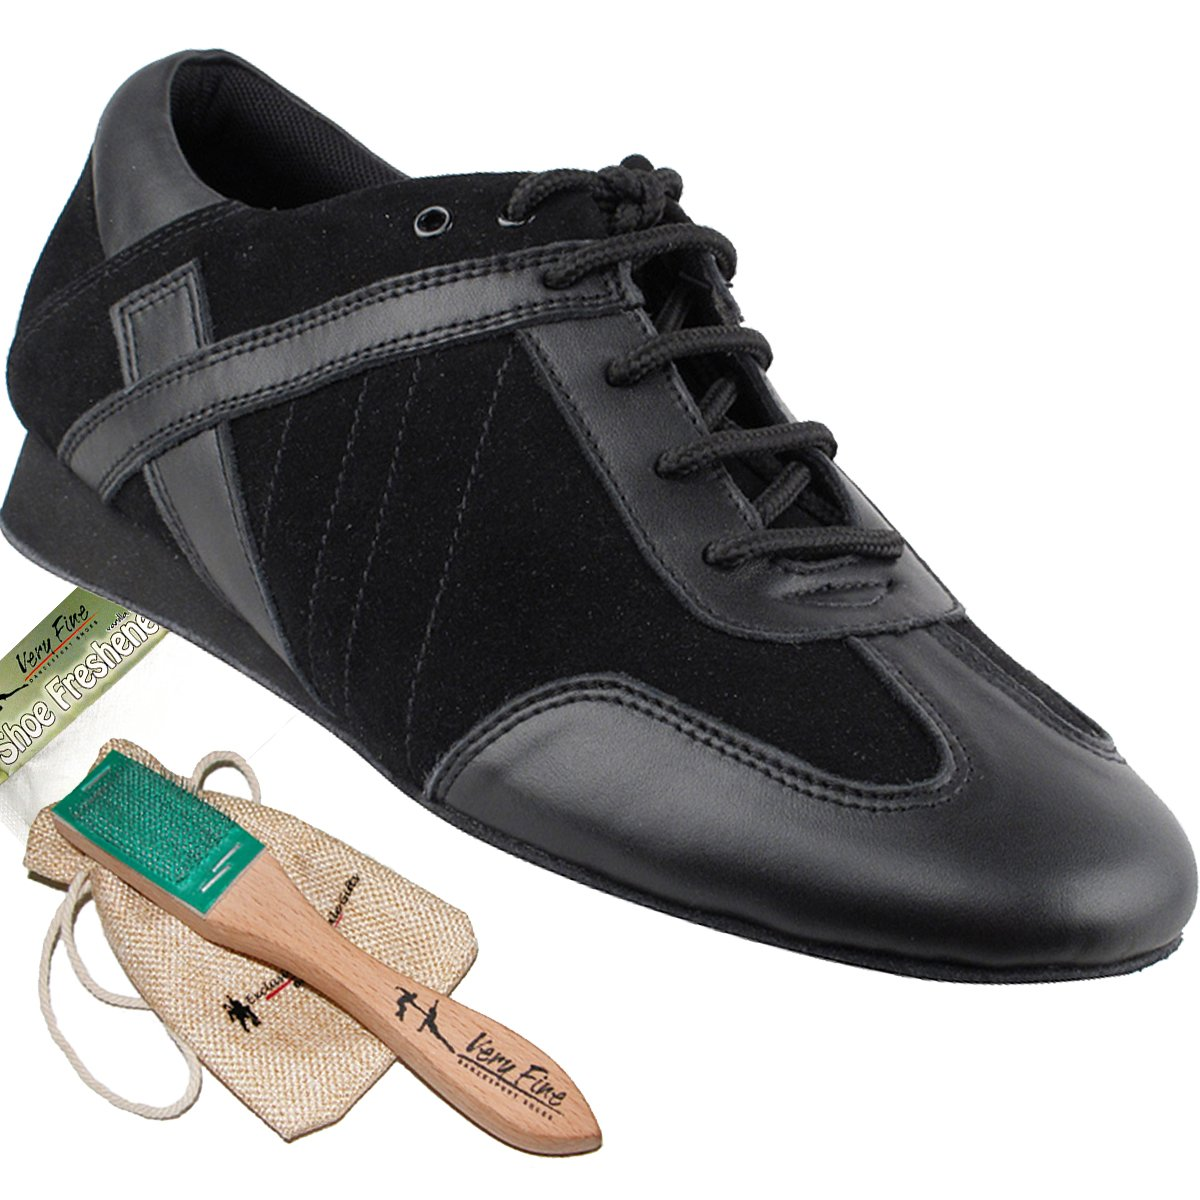 Men's Ballroom Latin Salsa Sneaker Dance Shoes Leather Black SERO106BBXEB Comfortable - Very Fine 8.5 M US [Bundle of 5] by Very Fine Dance Shoes